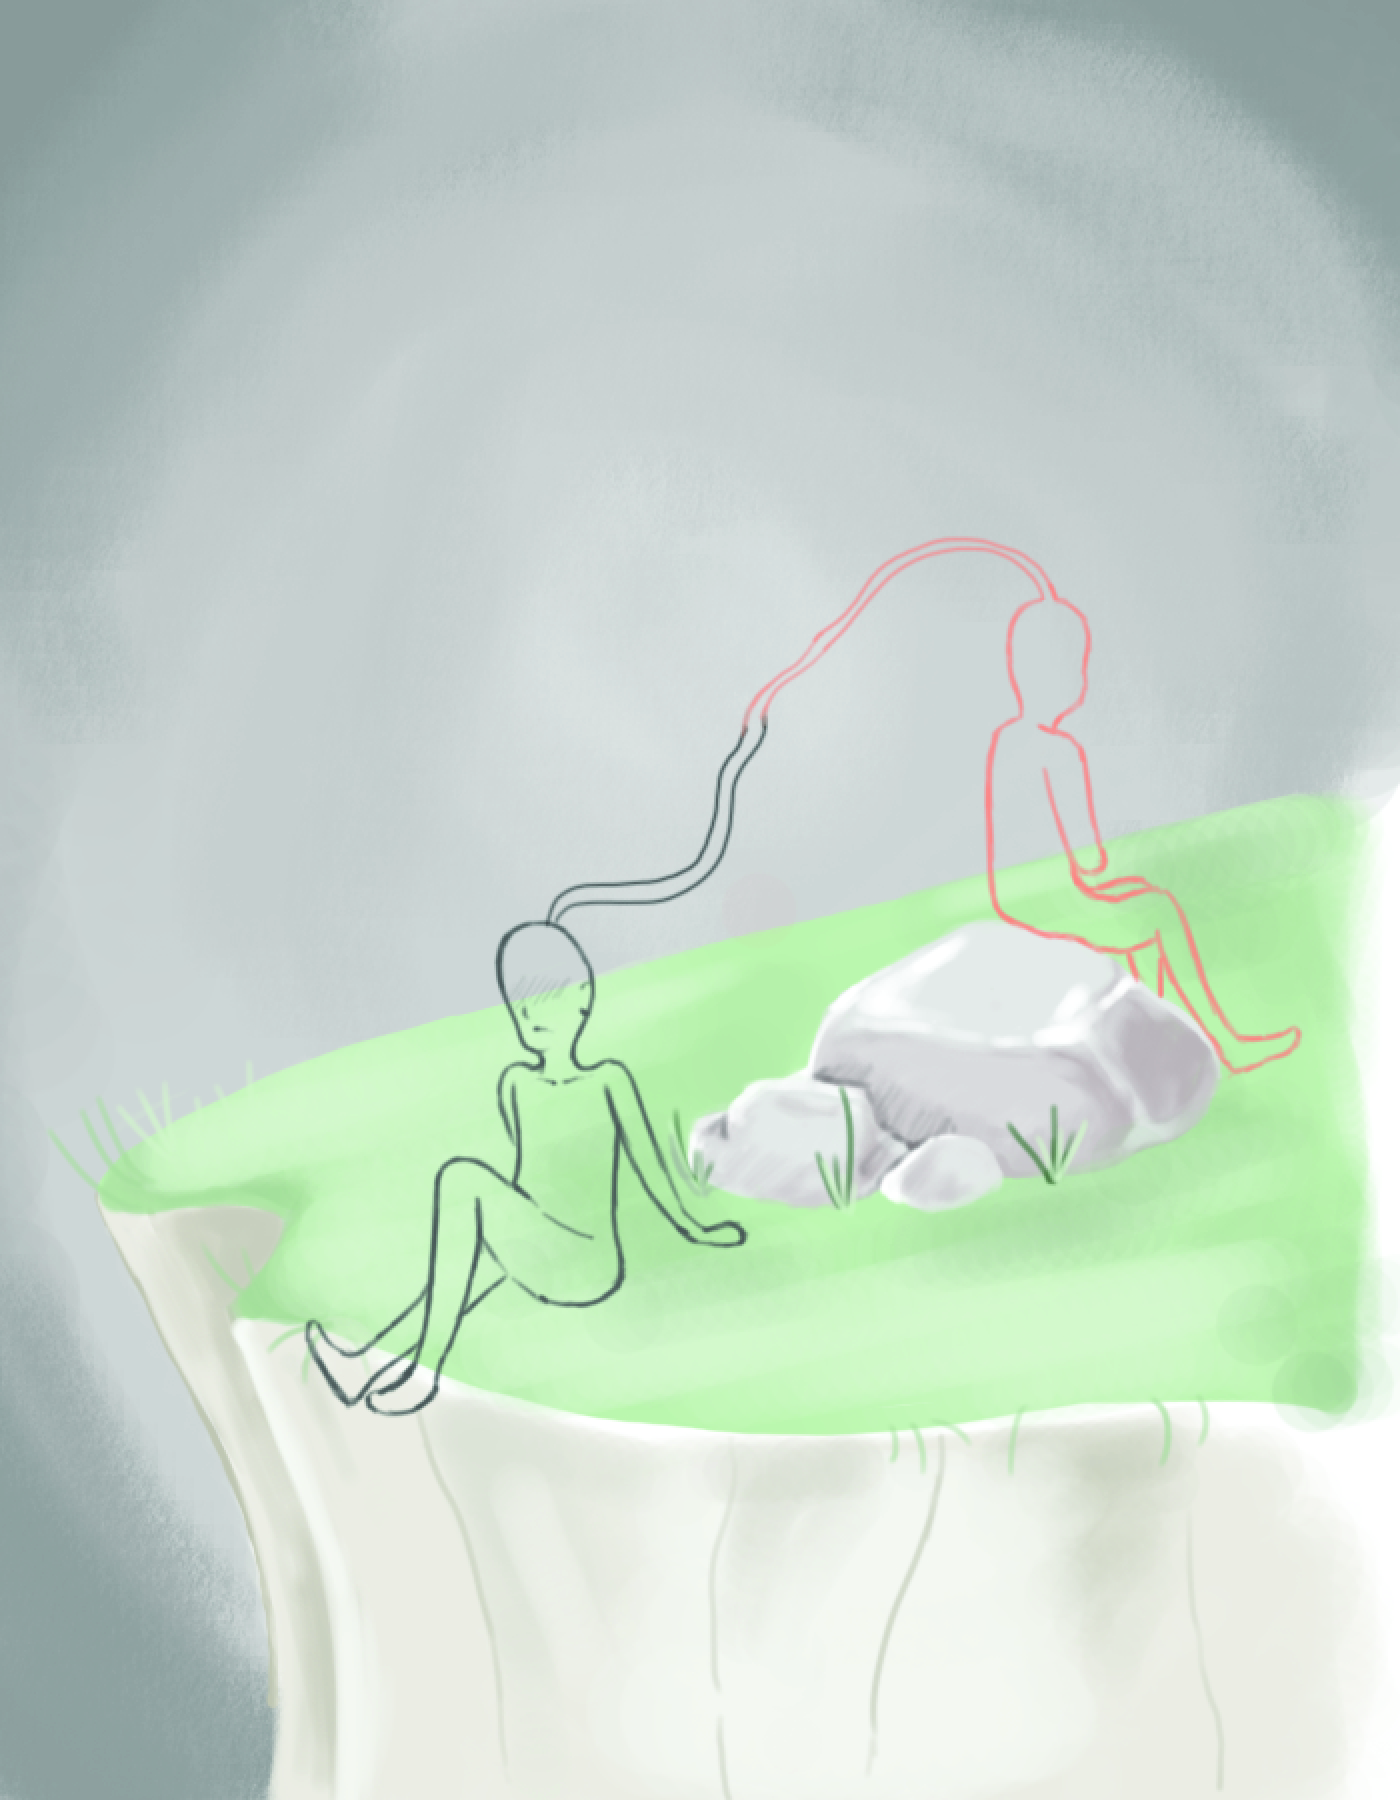 Photo illustration by Mylan Le